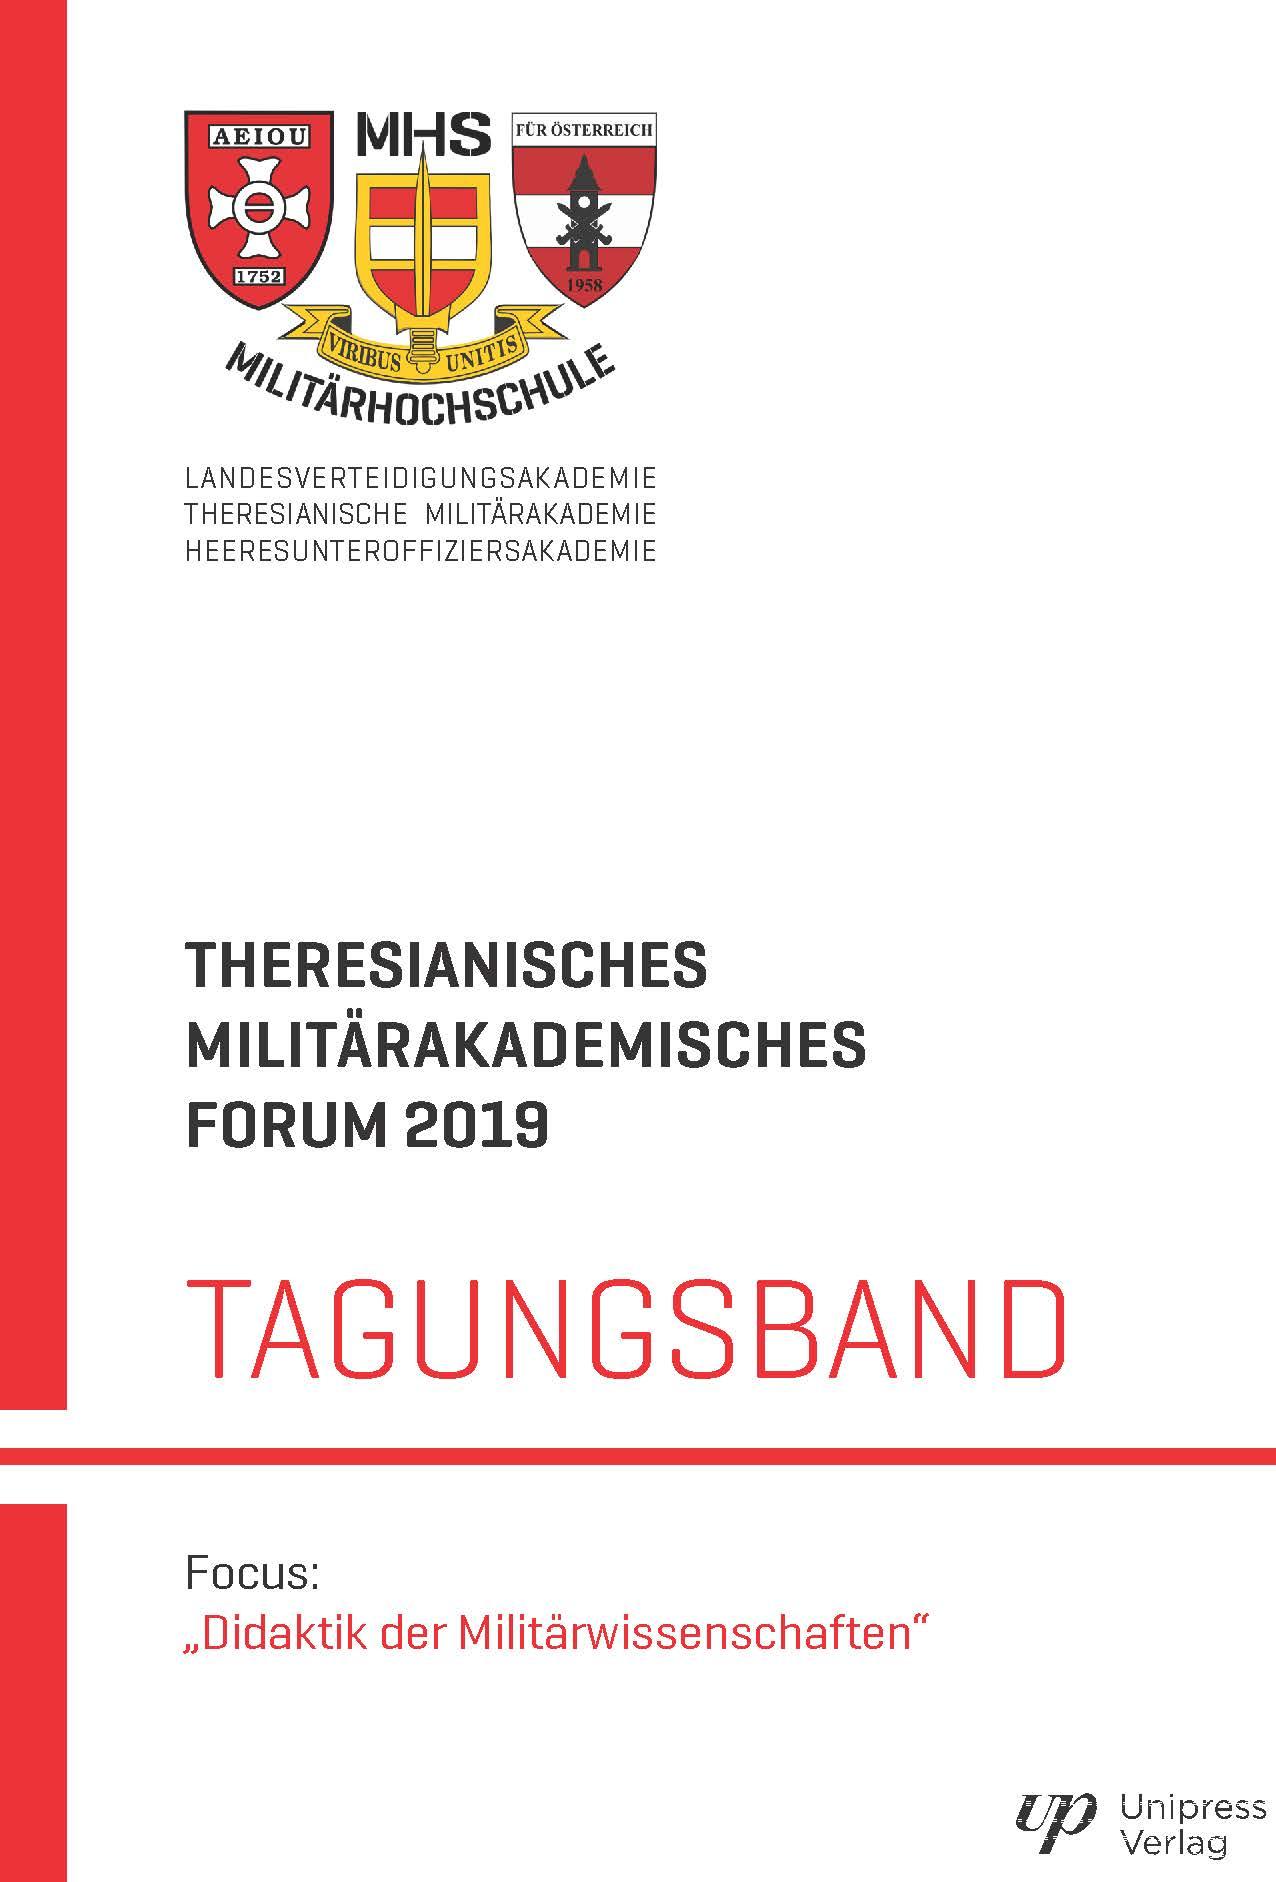 THERESIANISCHES MILITÄRAKADEMISCHES FORUM 2019